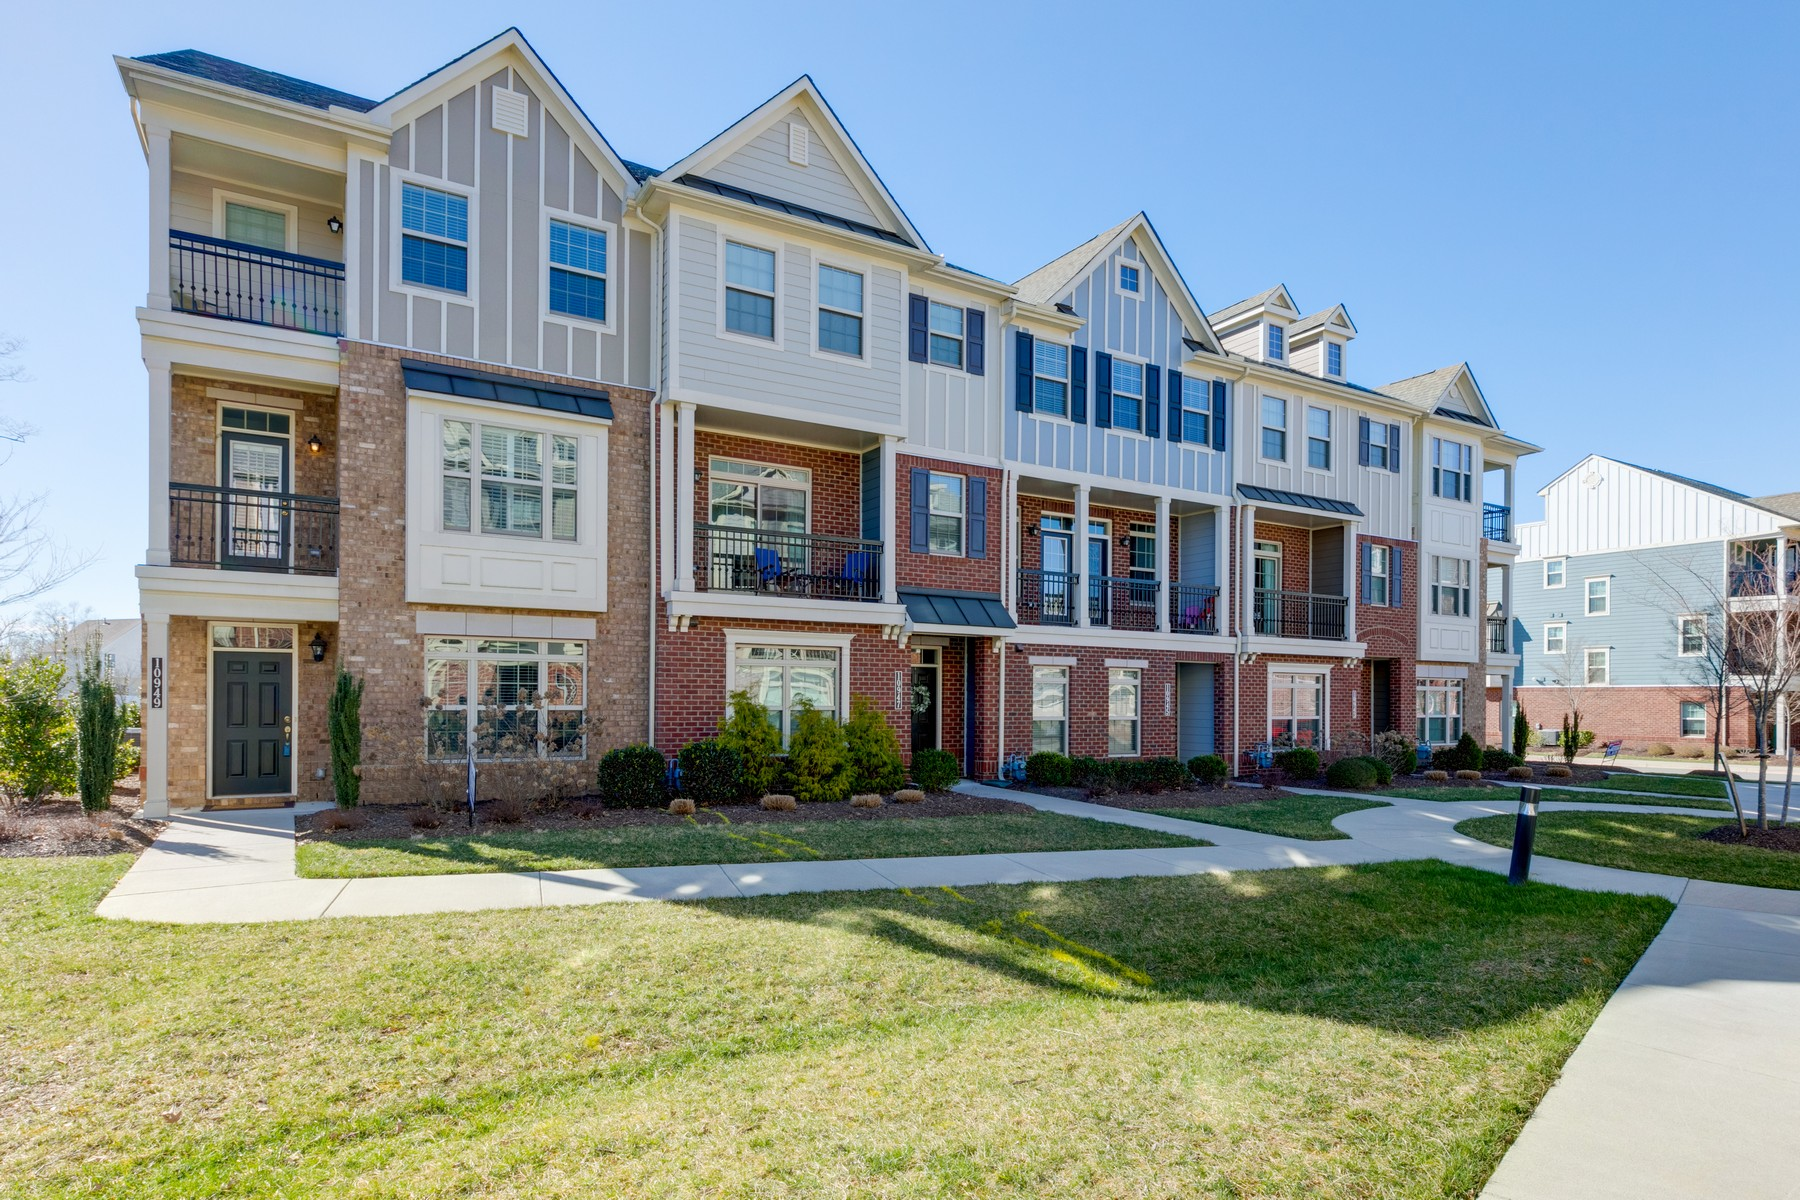 Condominium for Sale at 10947 Parkshire Lane, Henrico 10947 Parkshire Ln Henrico, Virginia 23233 United States